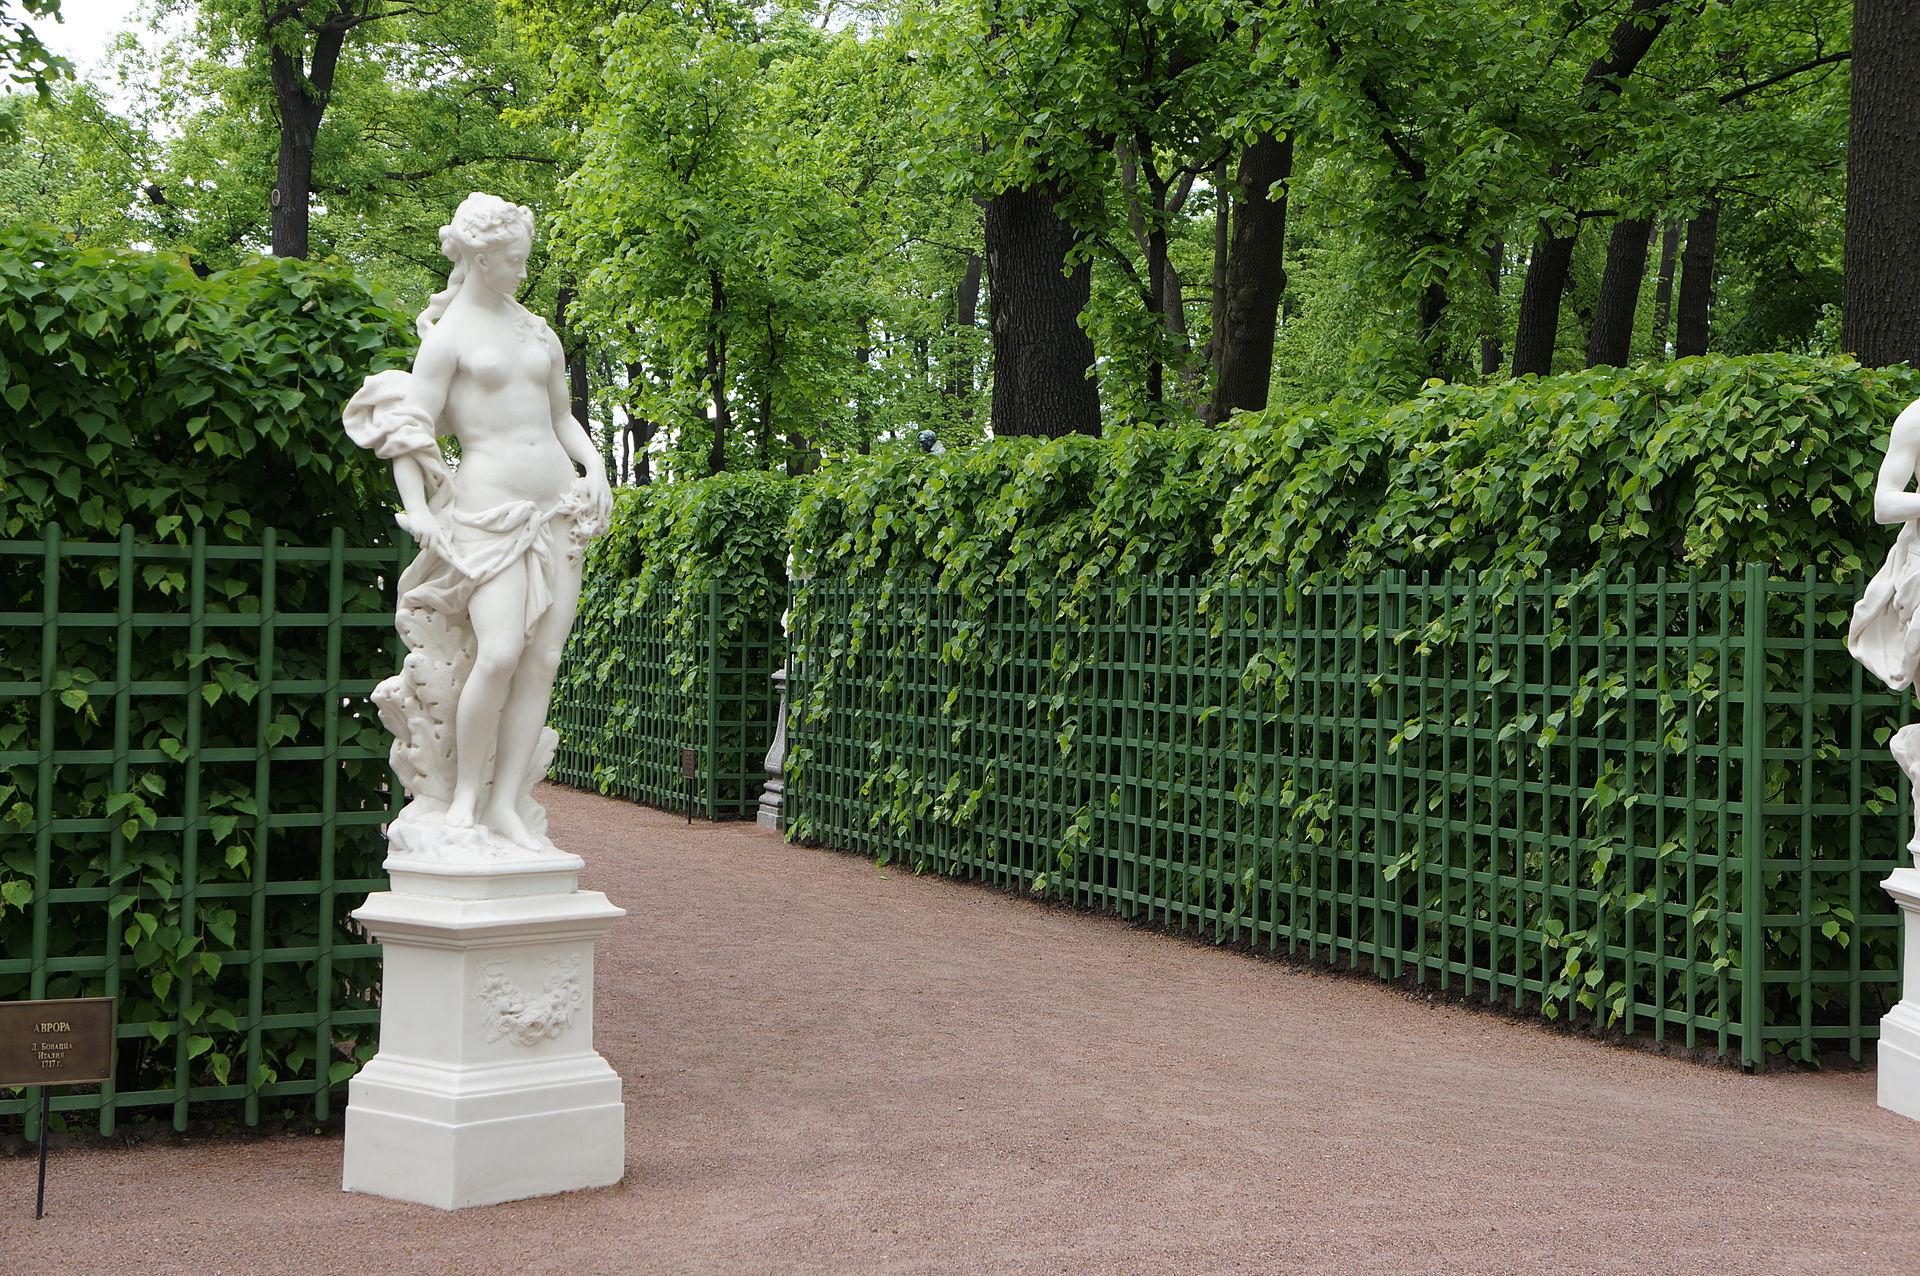 Летний сад. Центральная аллея. Шпалеры. Статуя. 2012 г. Автор фото: Евгений Со (Wikimedia Commons)